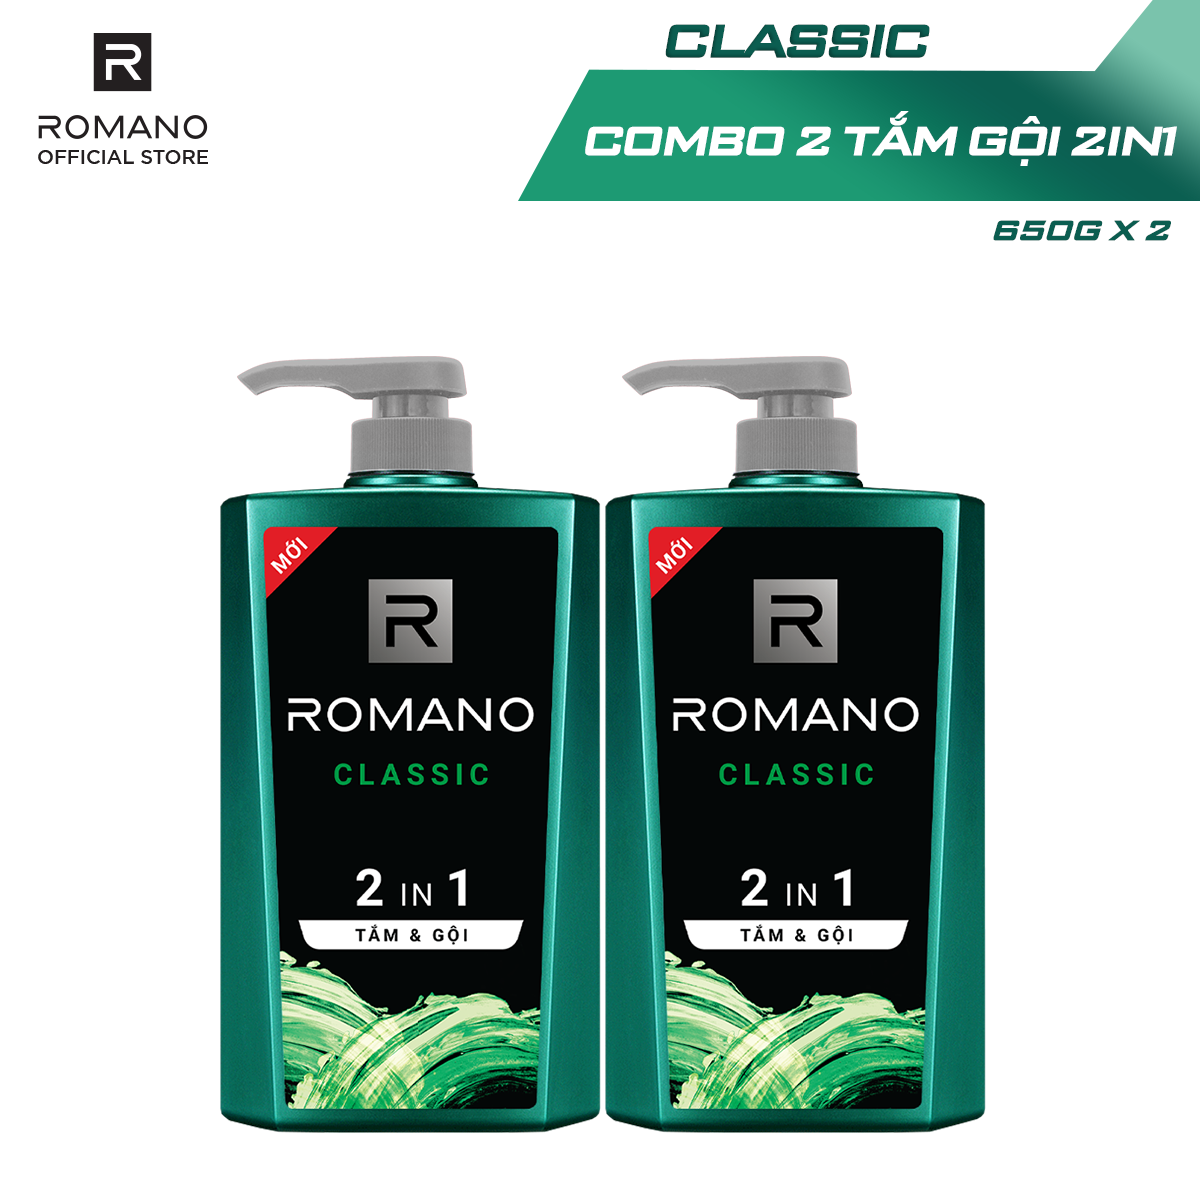 Combo 2 Tắm gội 2 trong 1 Romano Classic 650g/chai